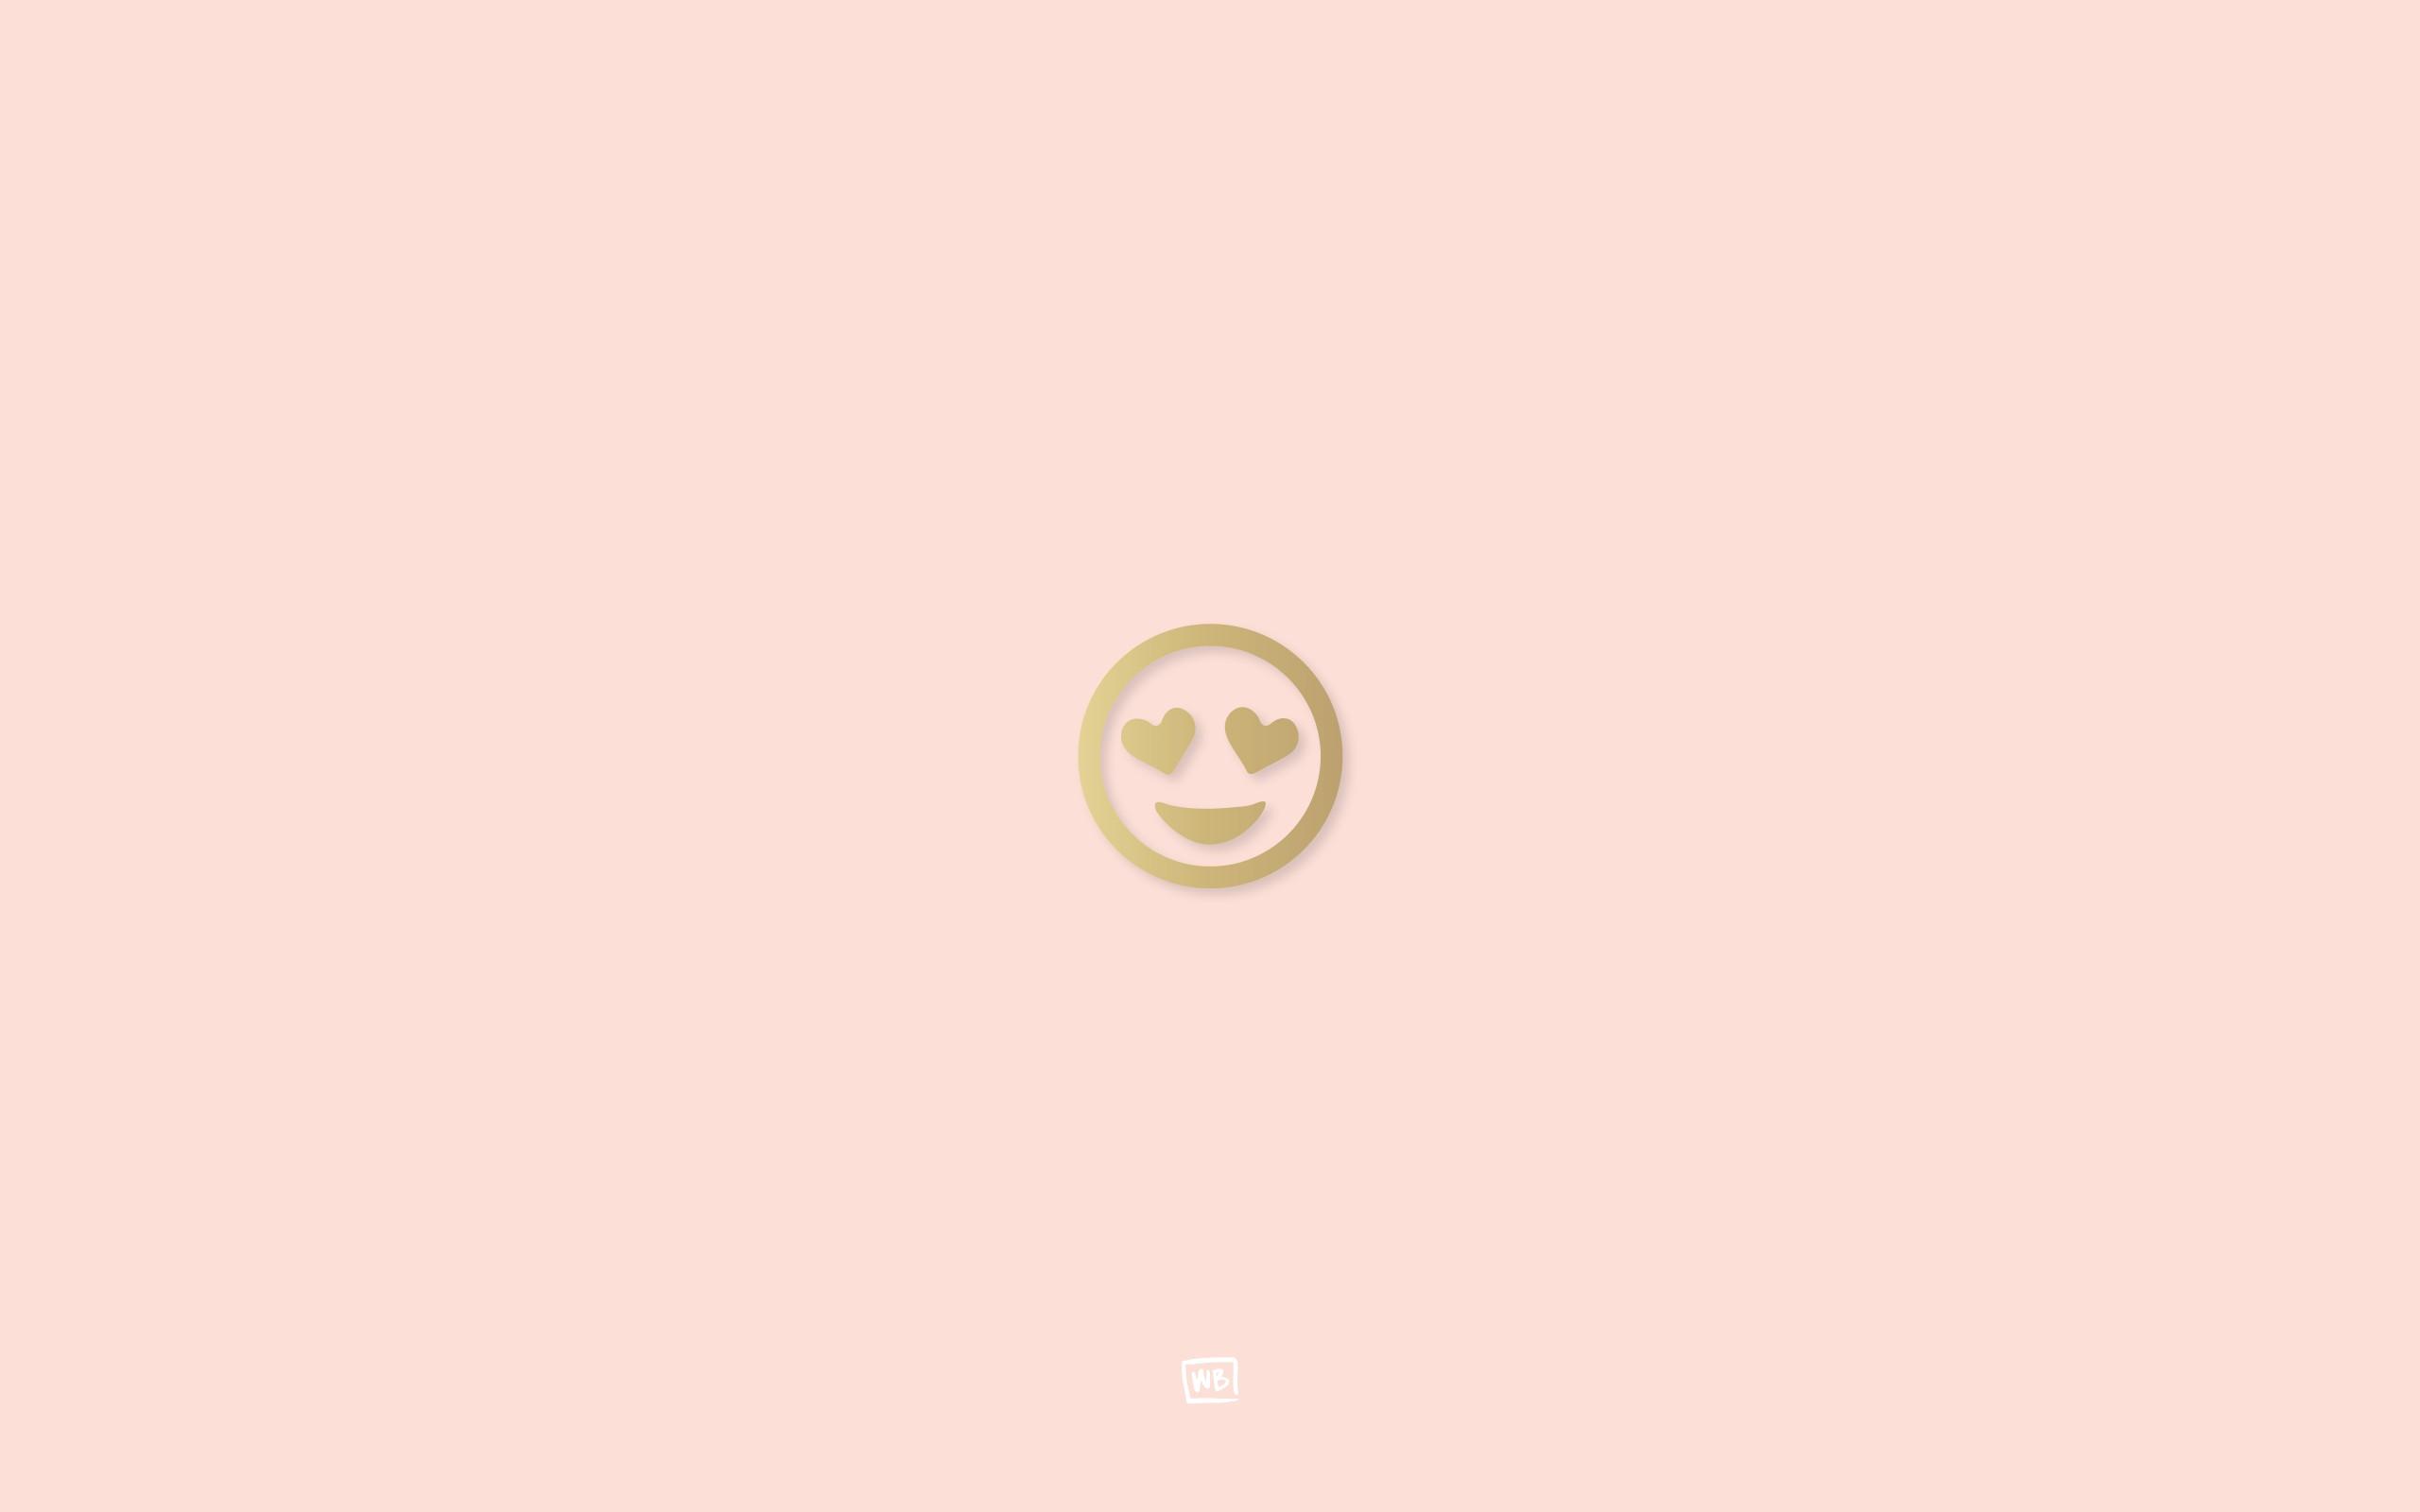 Emoji Wallpaper Download Free Amazing High Resolution